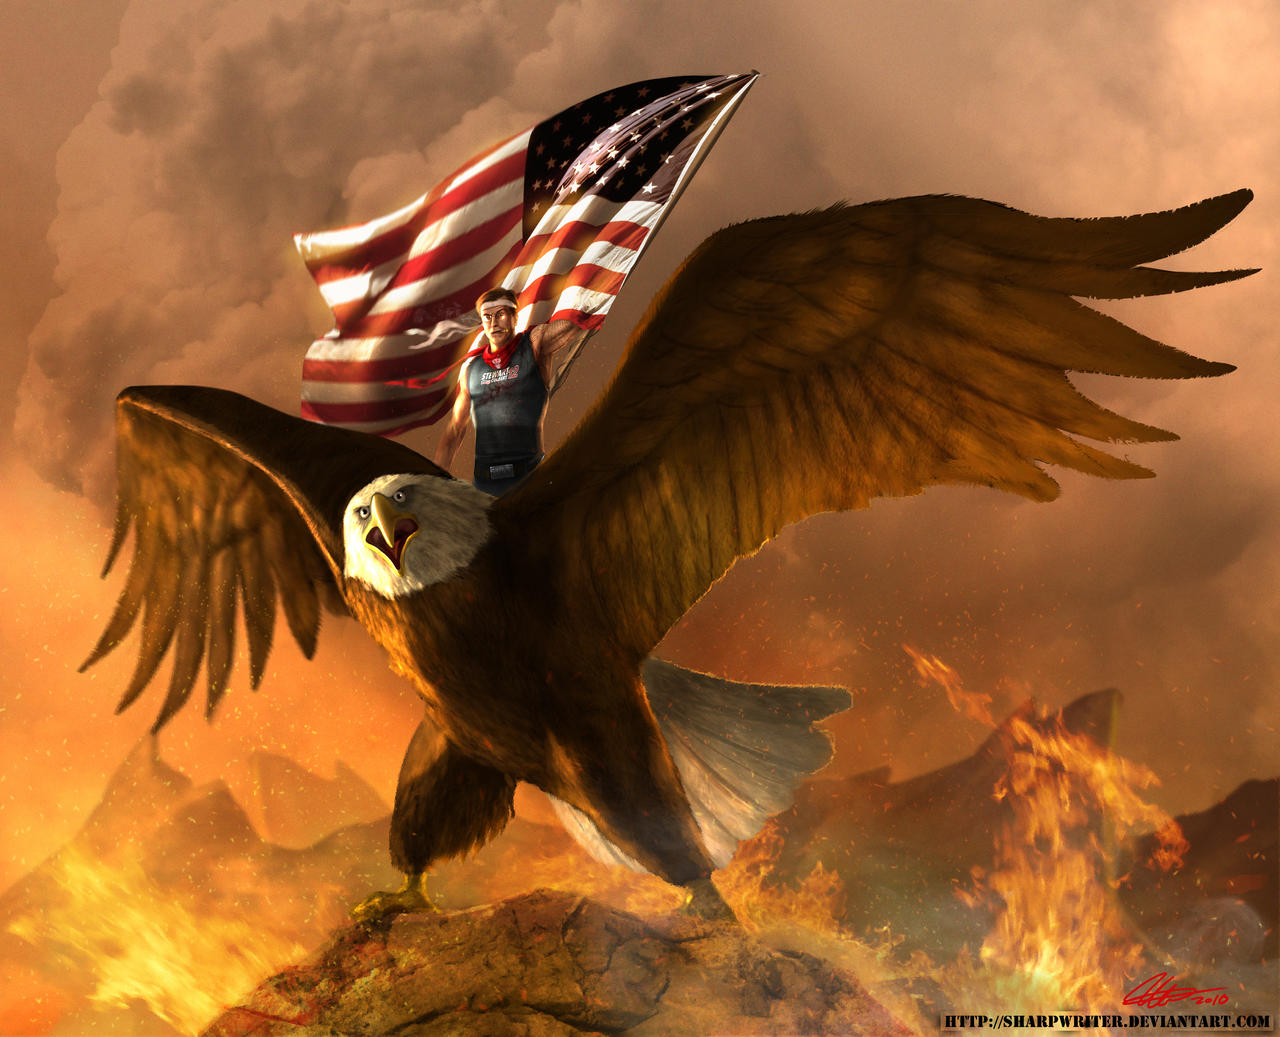 Stephen Colbert atop an eagle